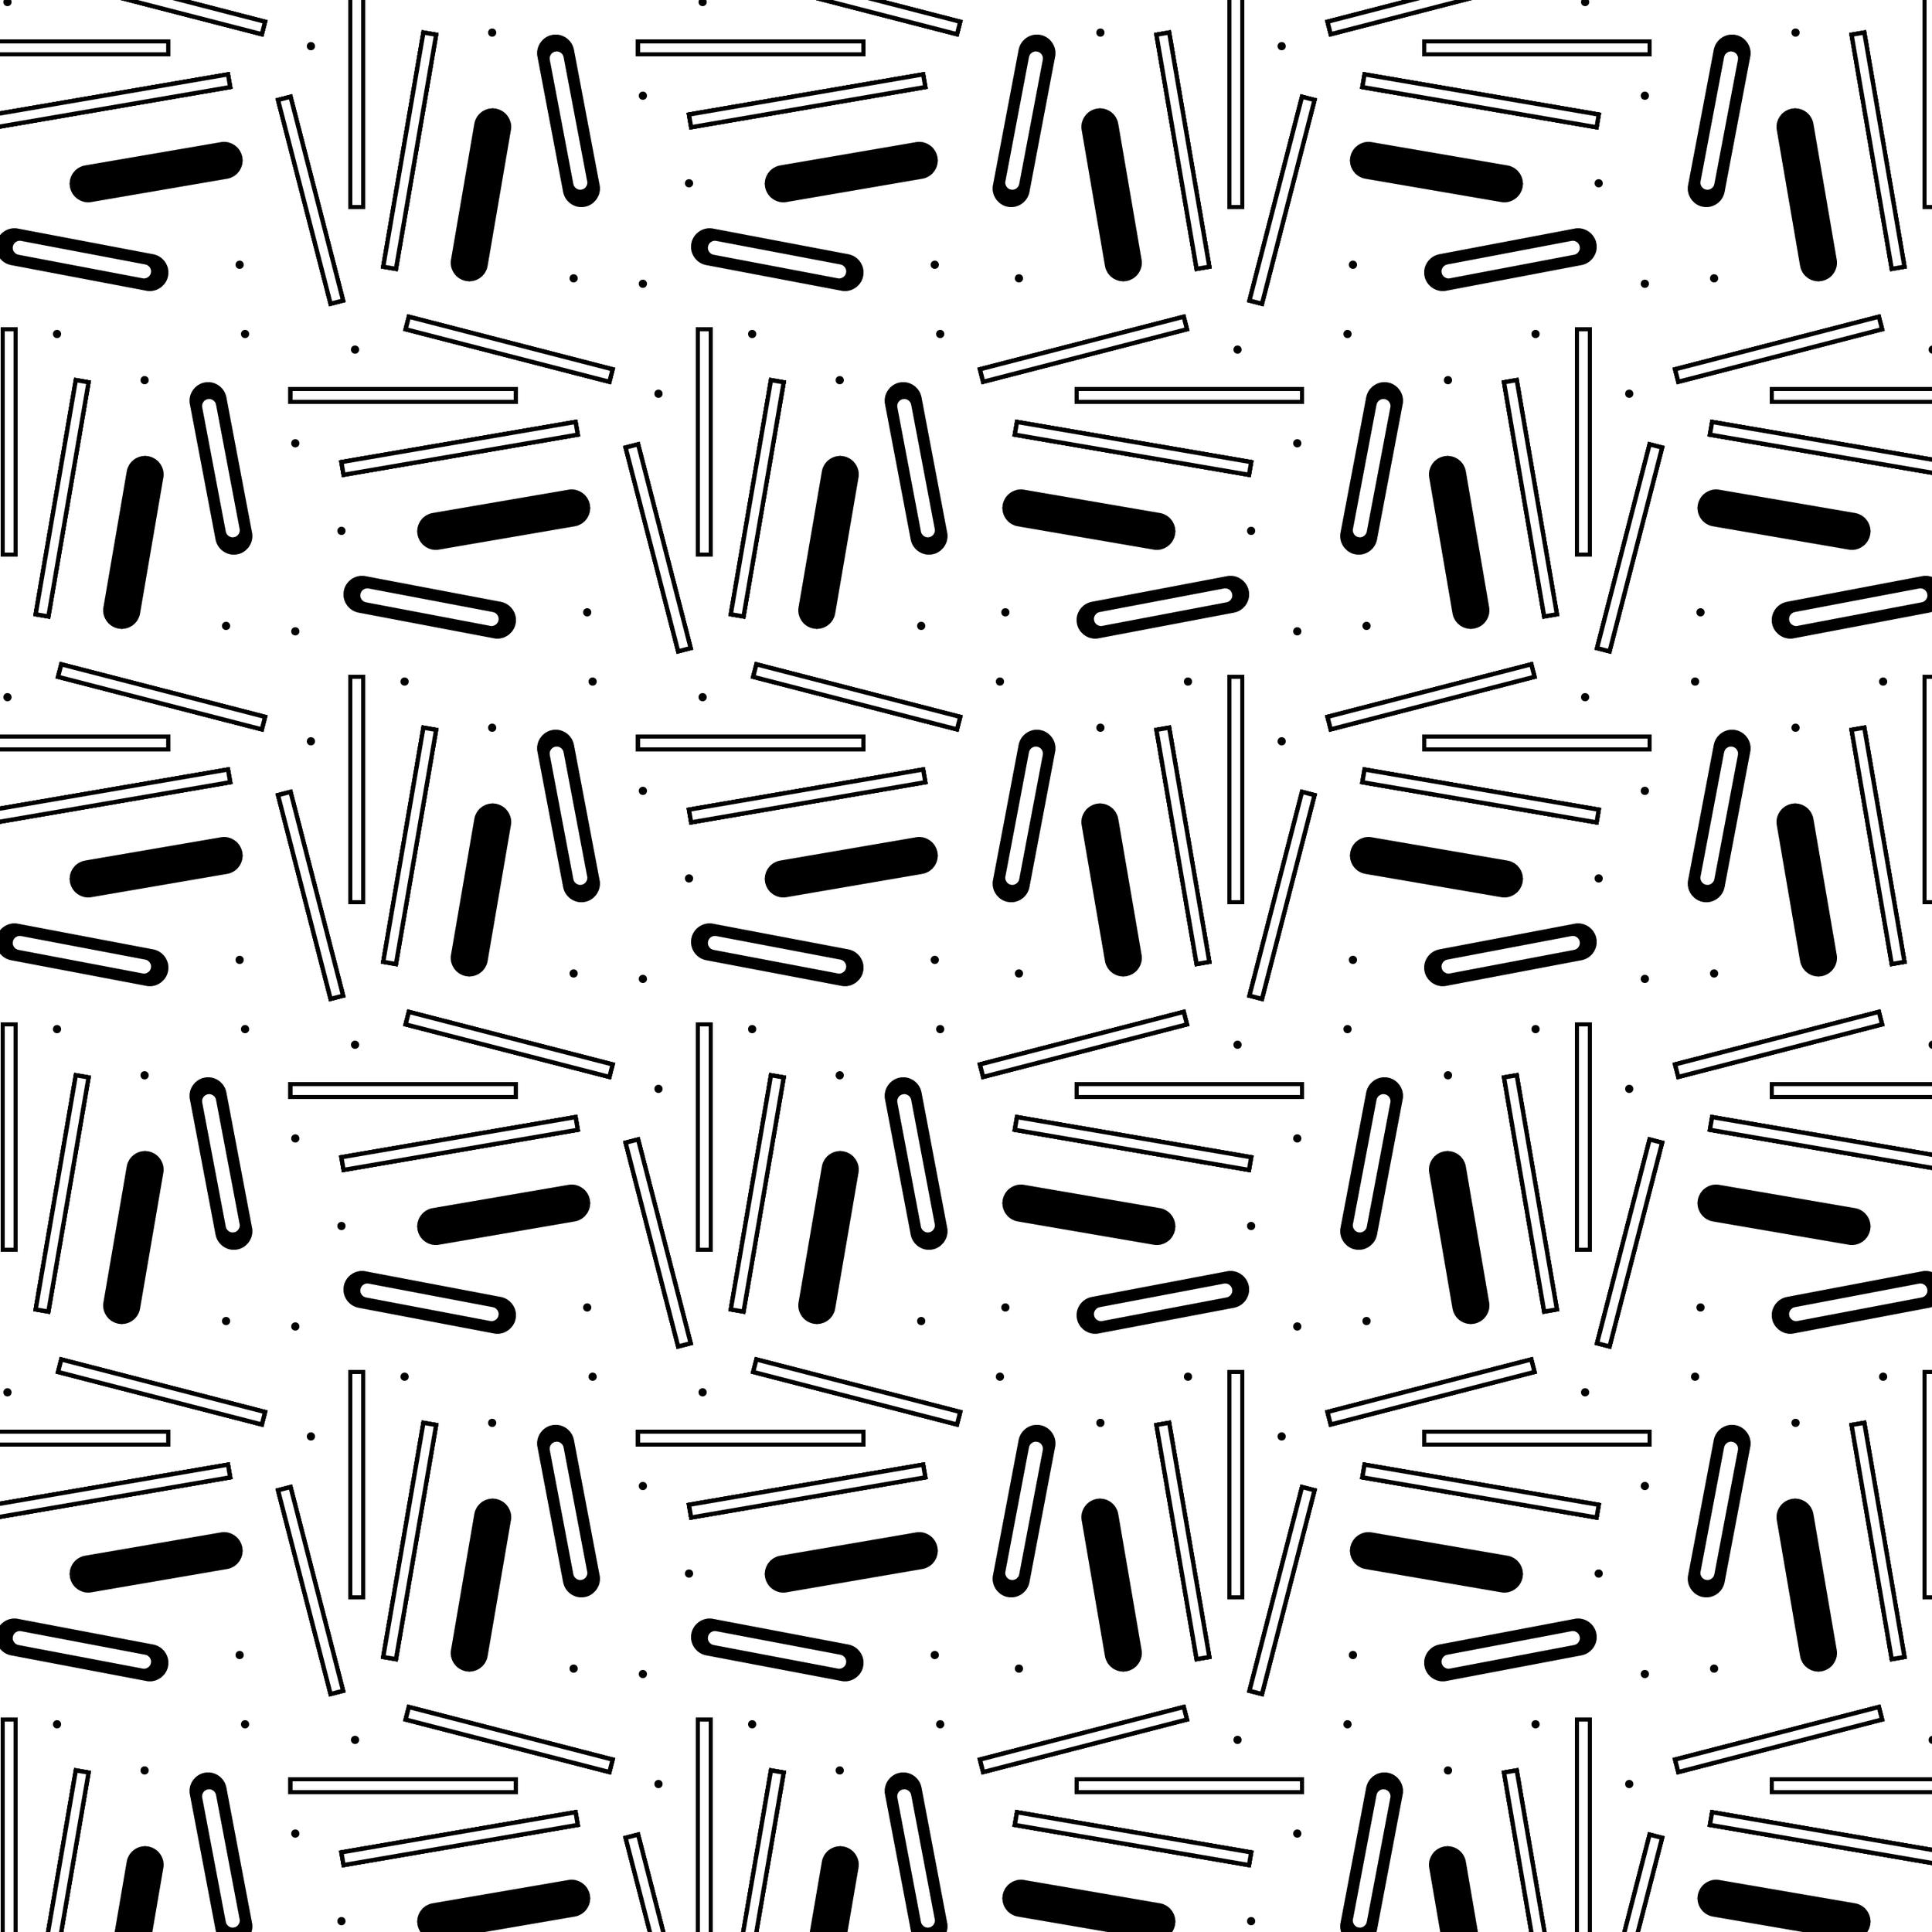 mssanche_Postmodern_pattern.png